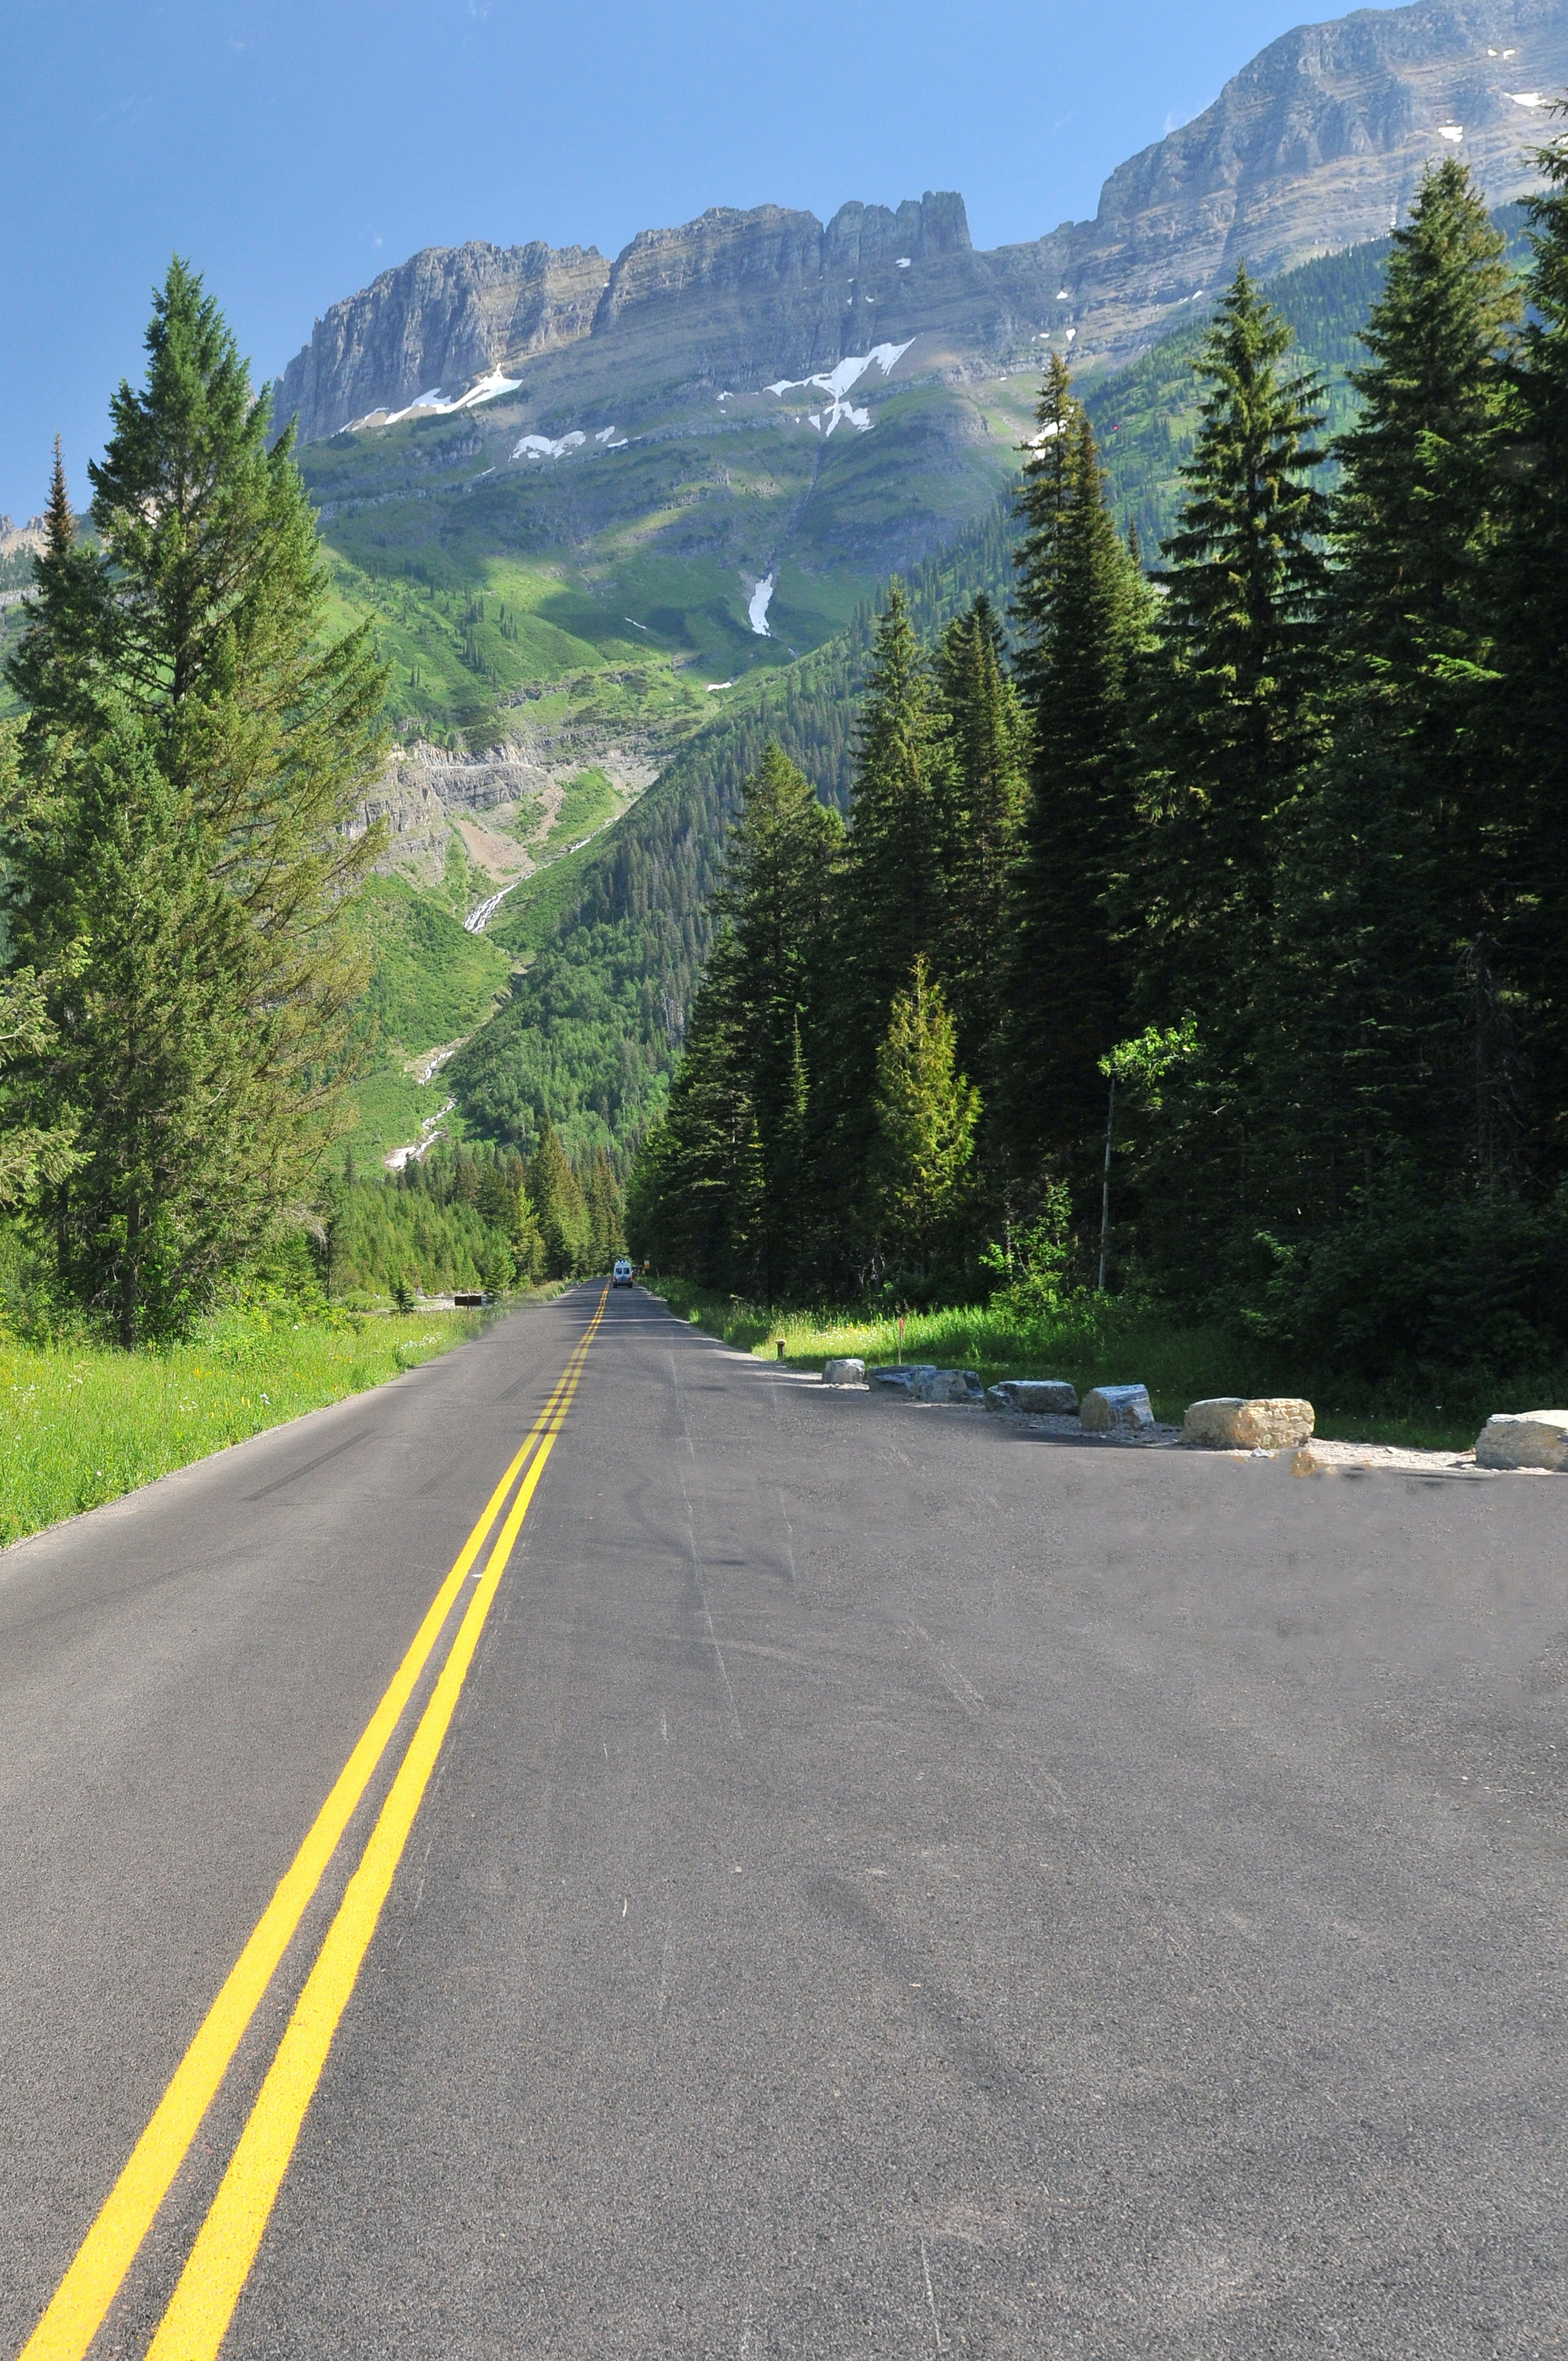 Kostenloses Stock Foto zu asphalt, autobahn, bäume, berg